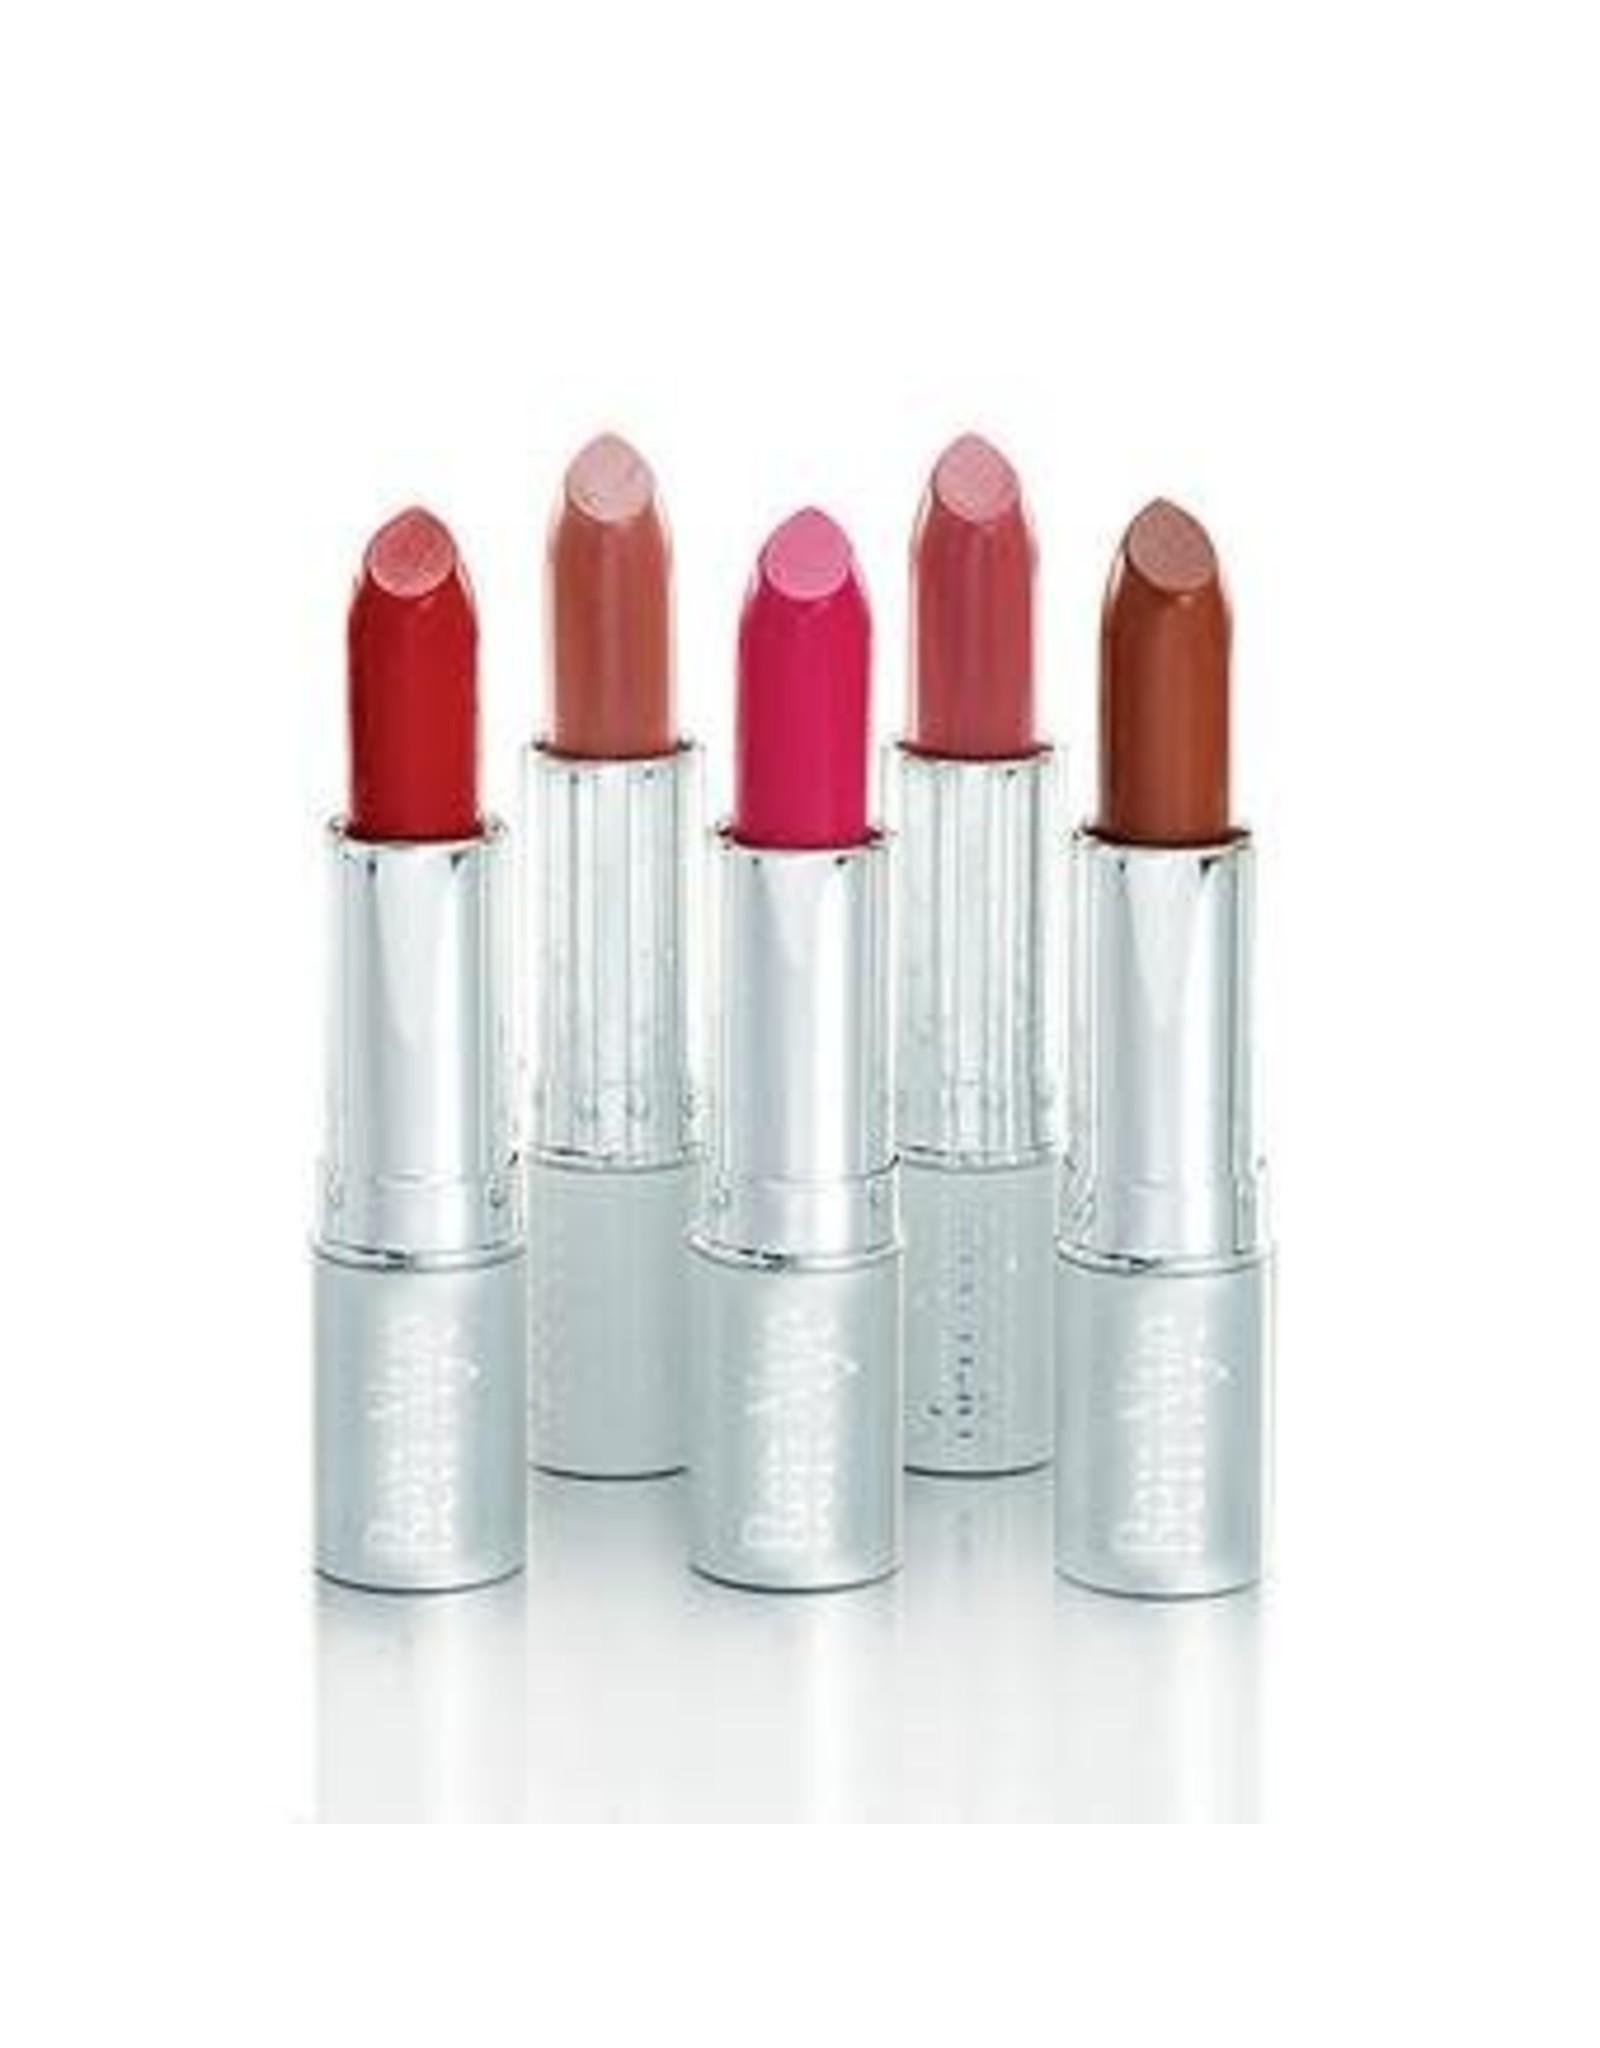 Ben Nye Ben Nye Lustrous Lipsticks